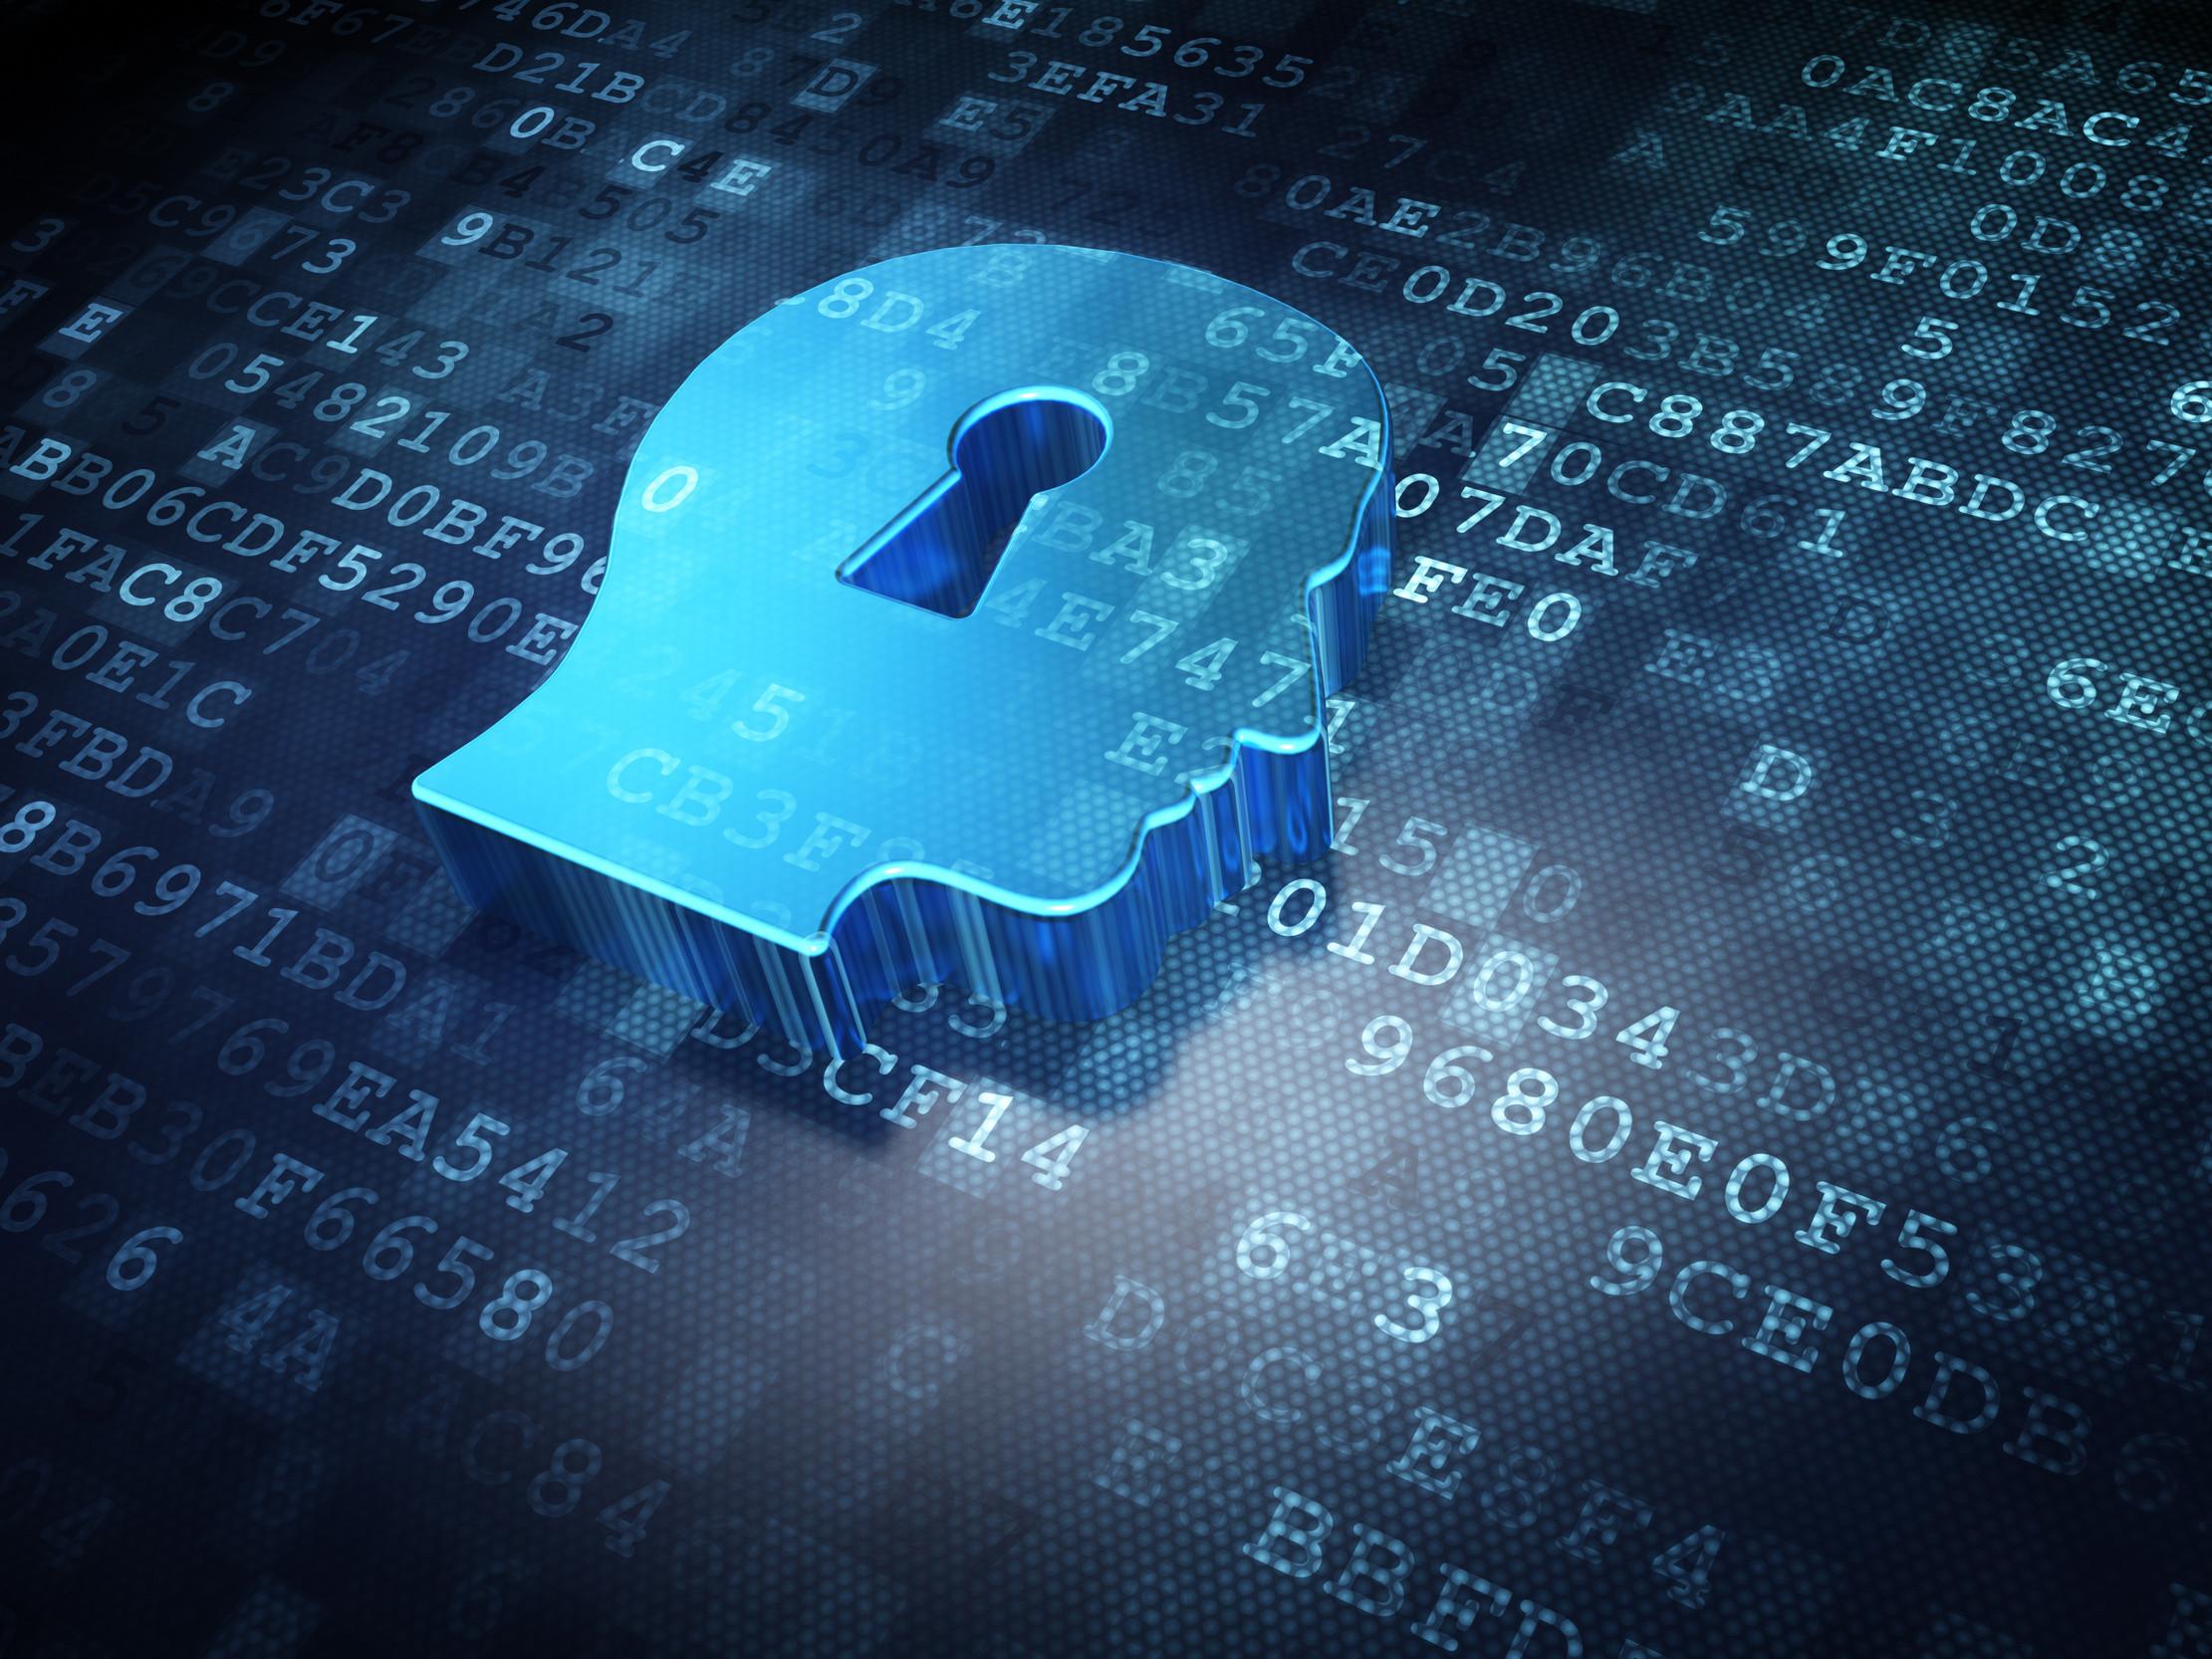 Brain Lock Cloud Security 3D Wallpaper Picture HD Free Download #7829892992  Wallpaper